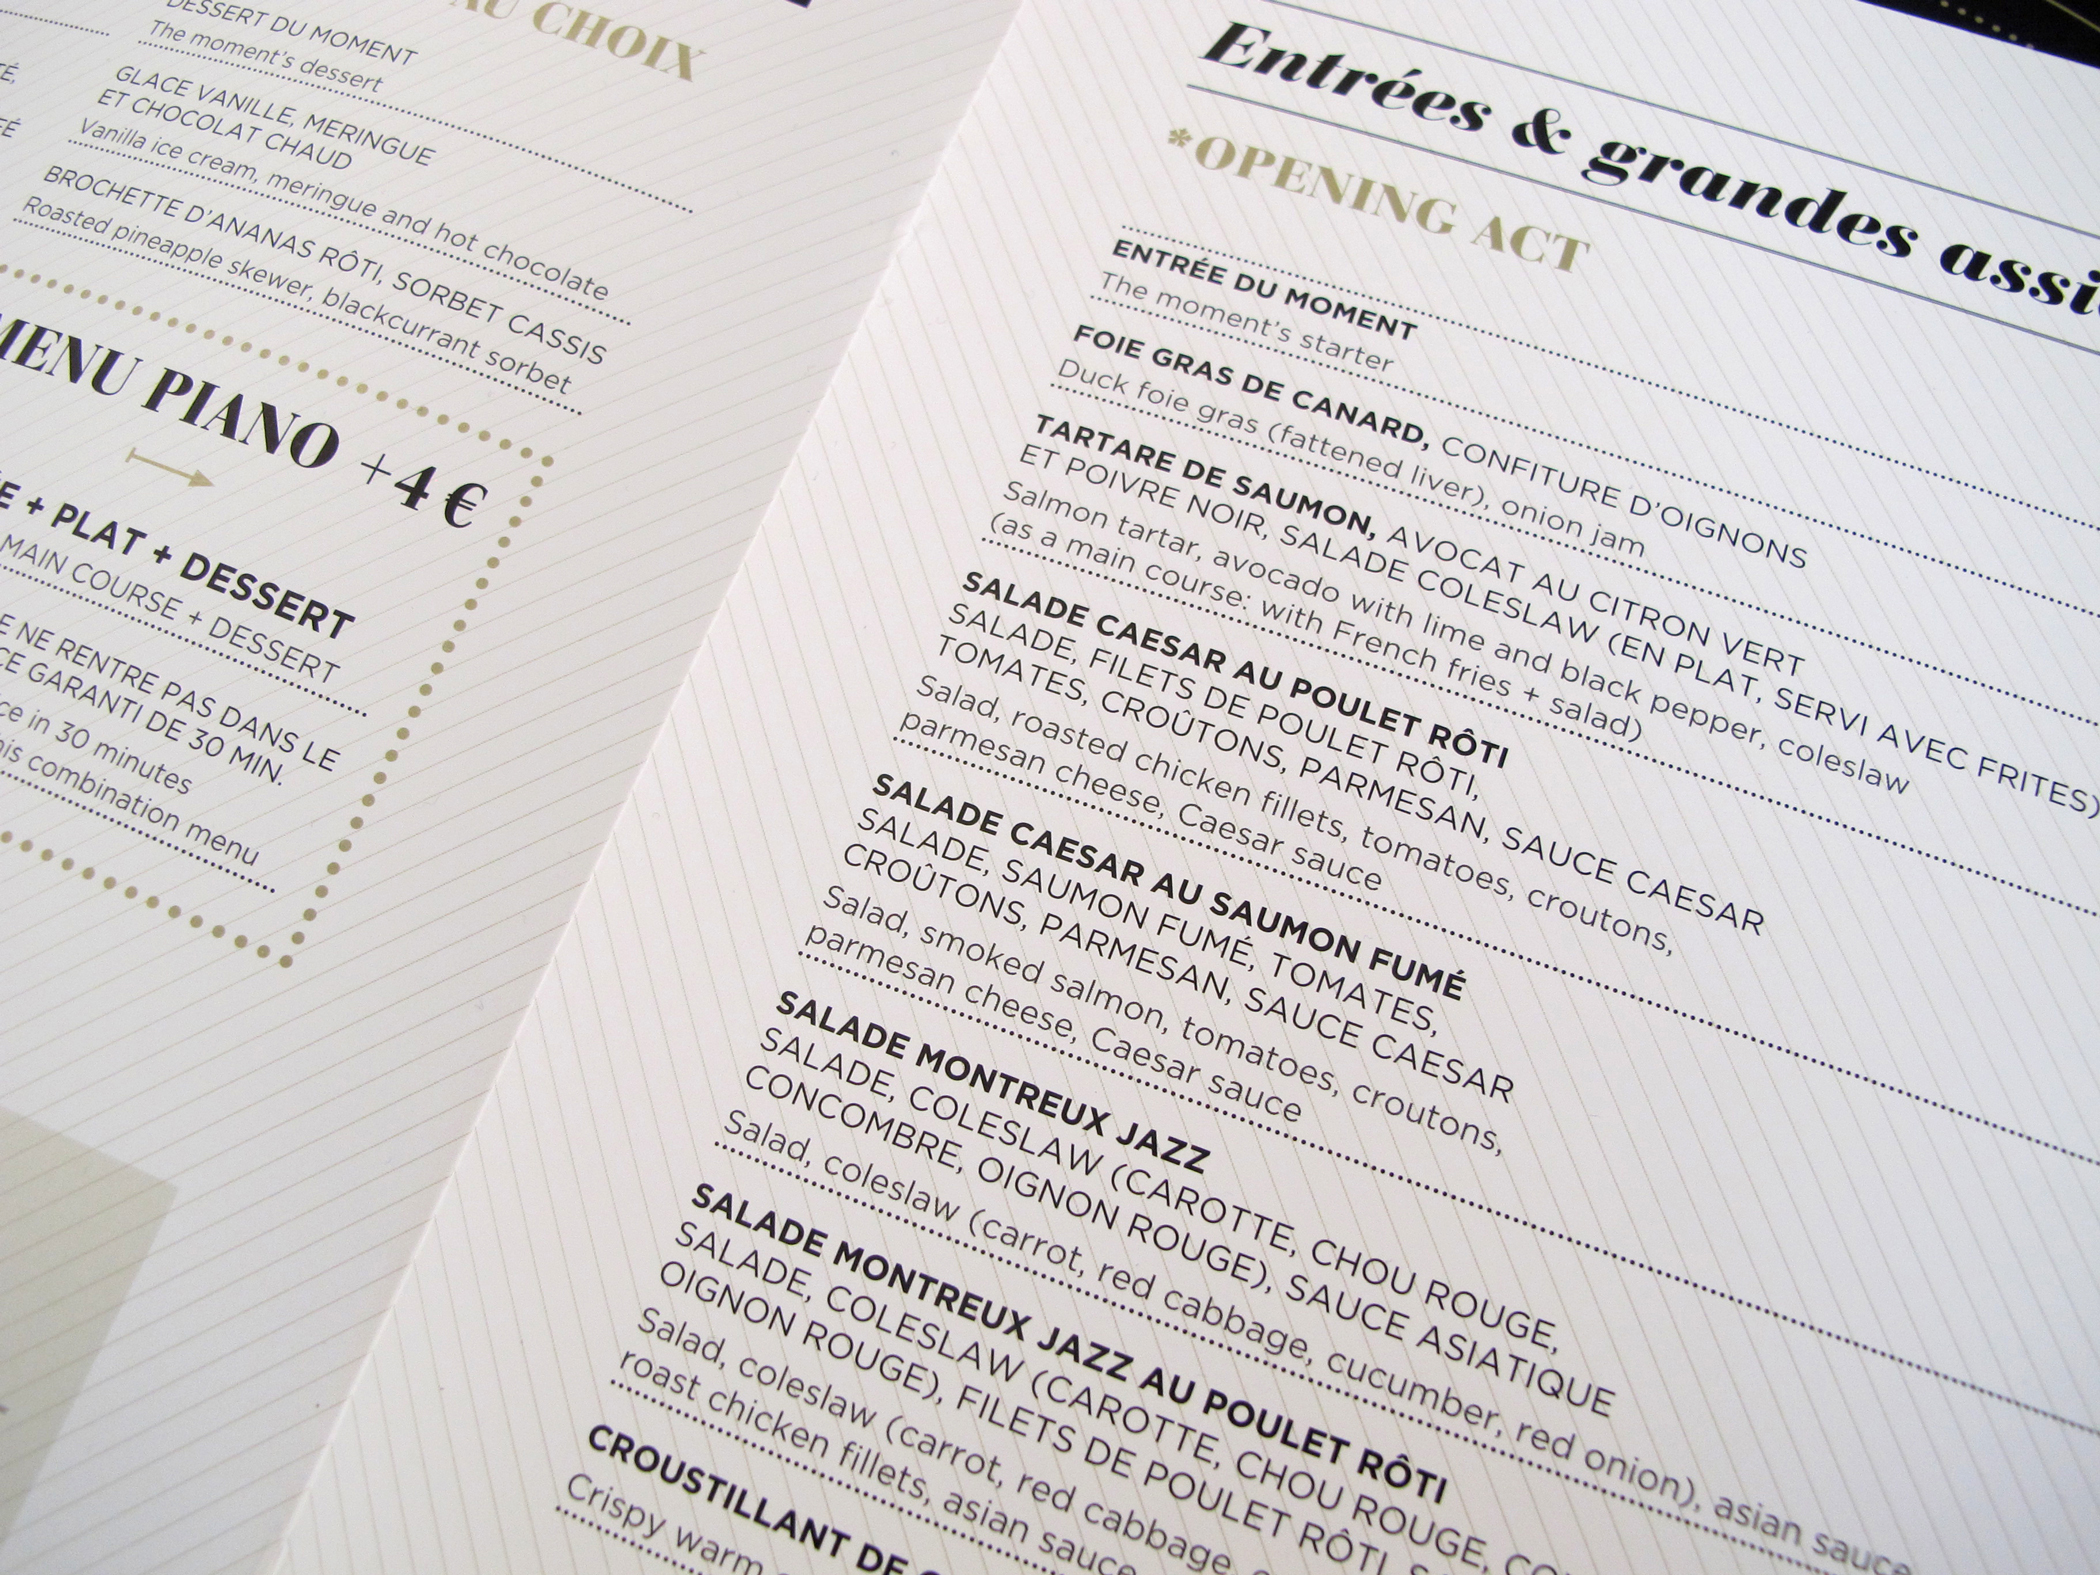 MJC-menu-2014-04